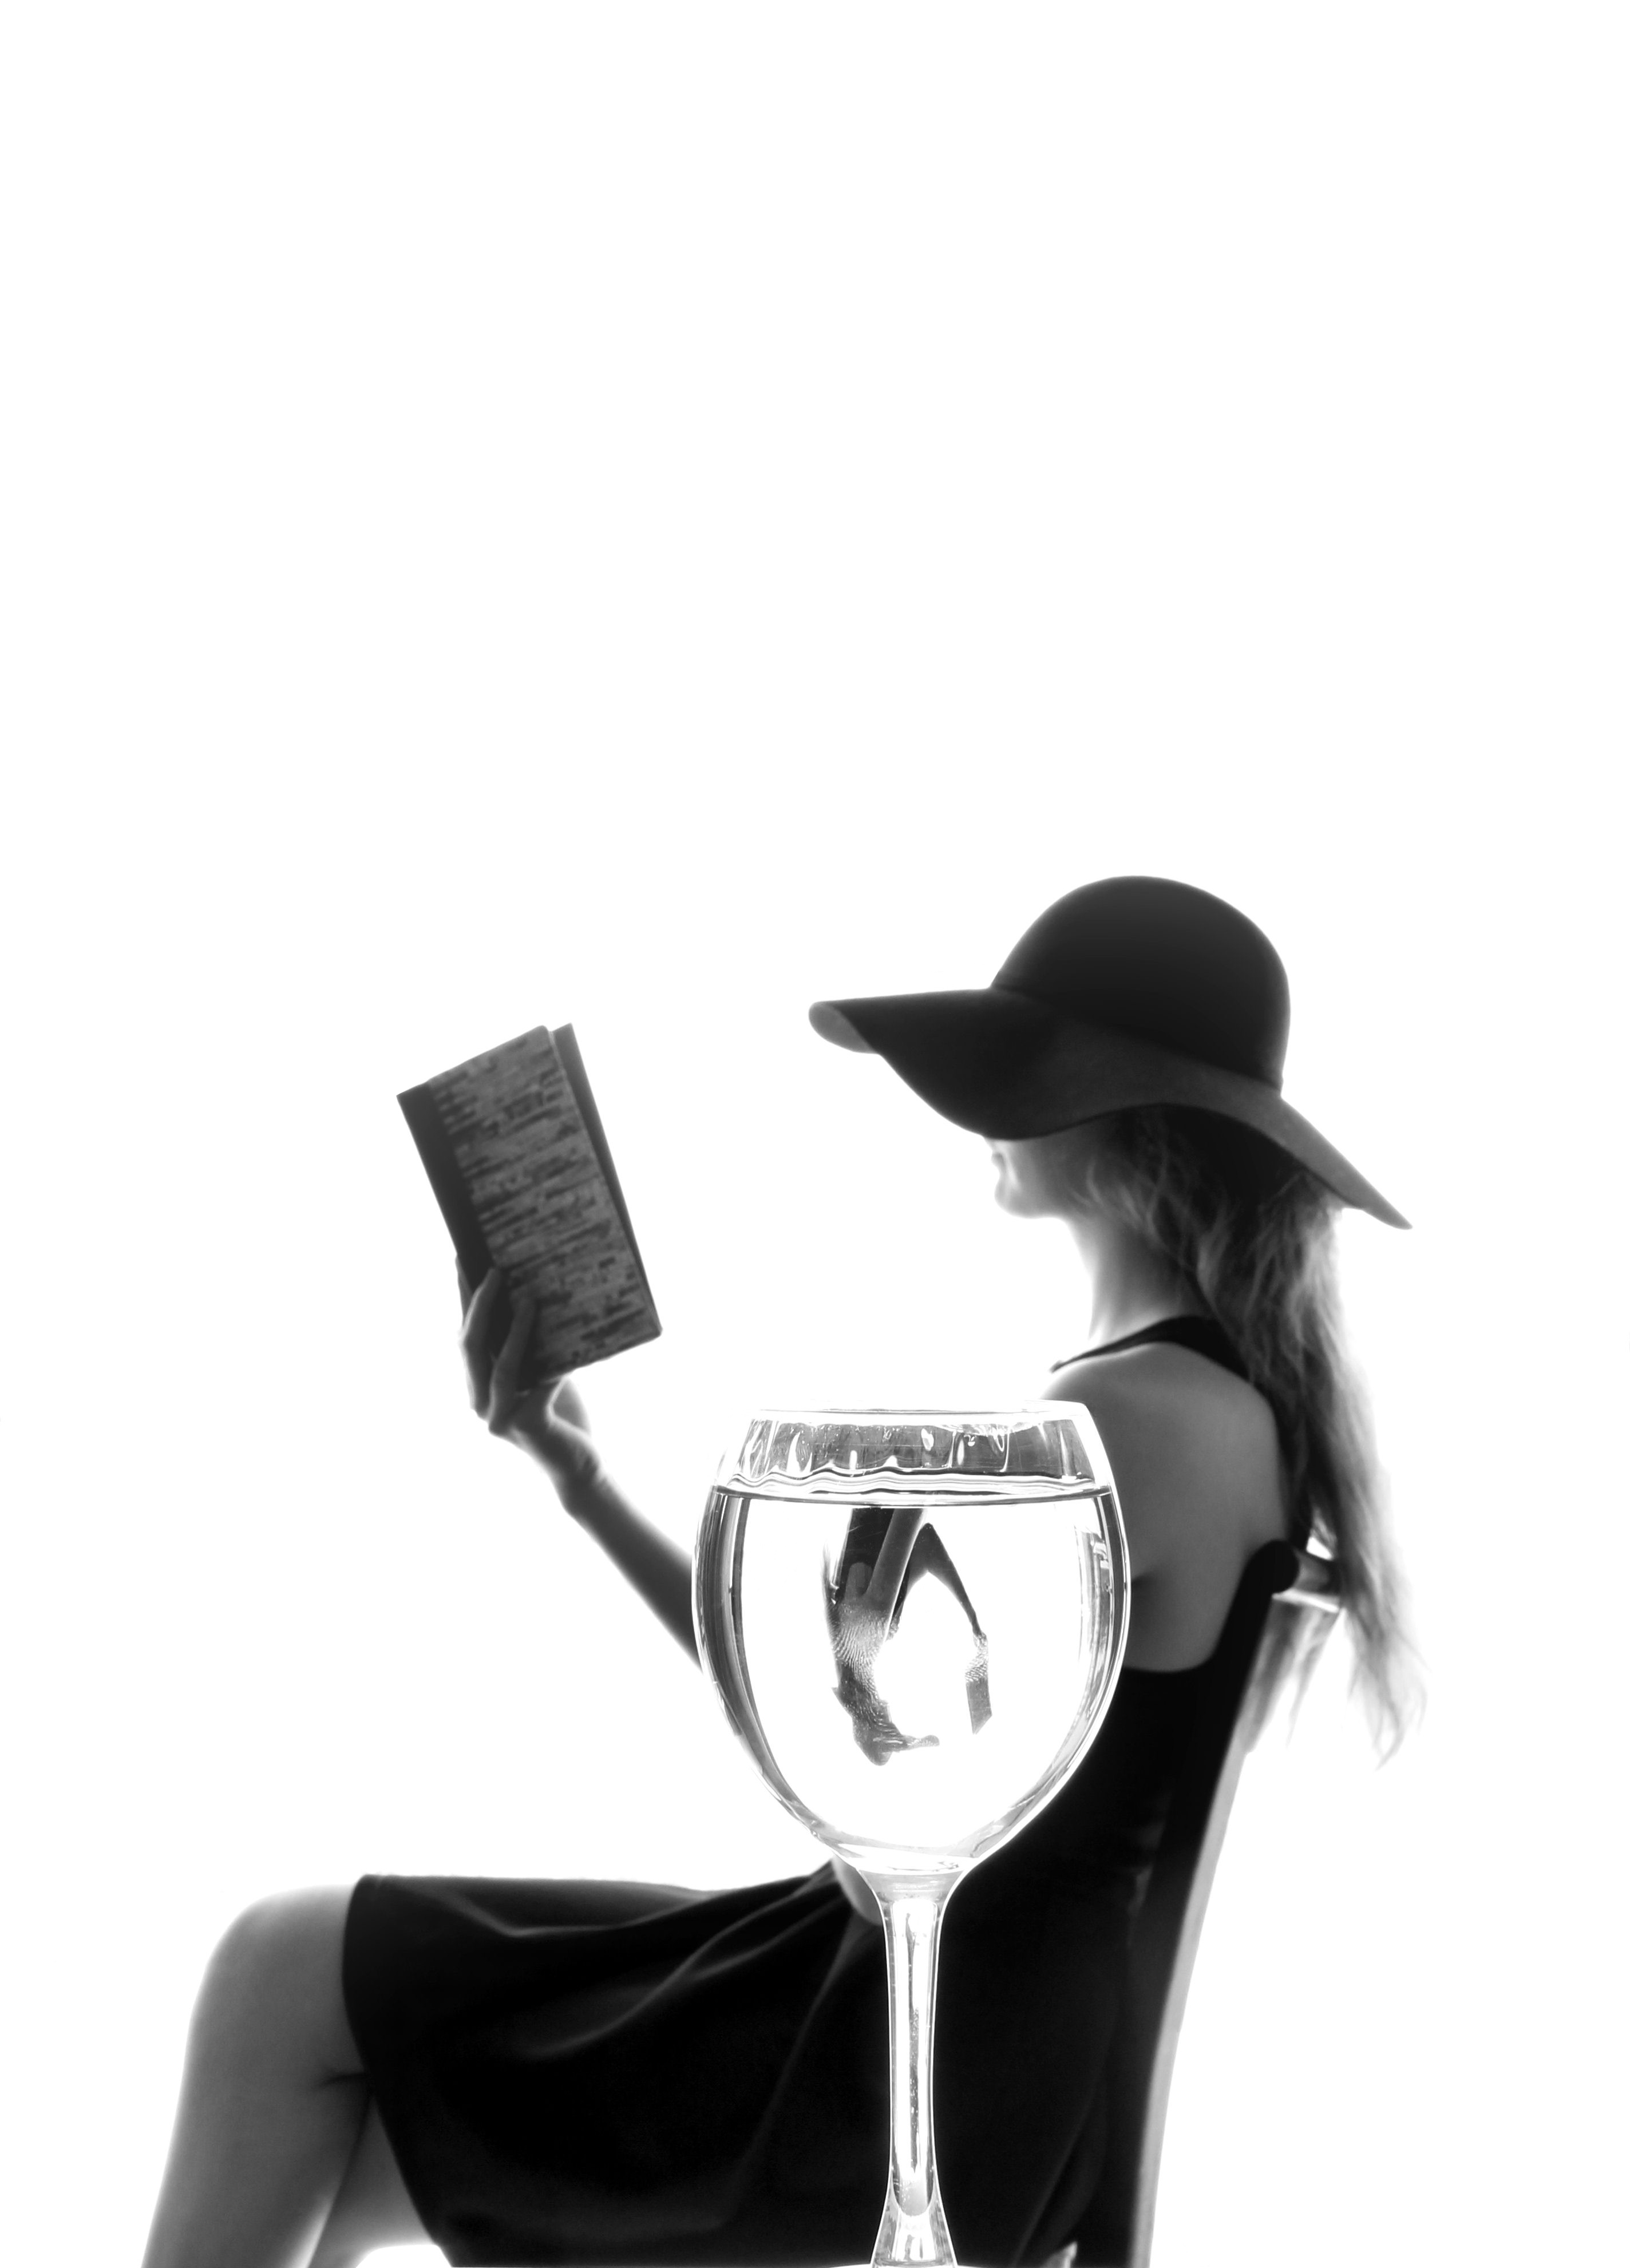 Mariana-Huben-Portrait.jpg